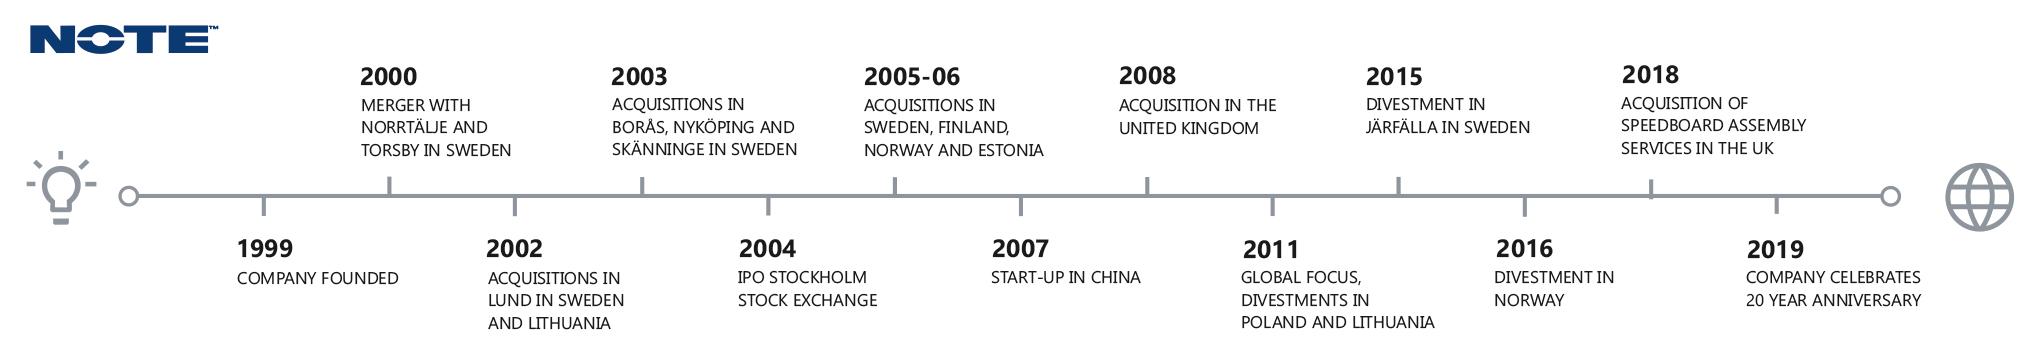 NOTE Windsor Company Timeline